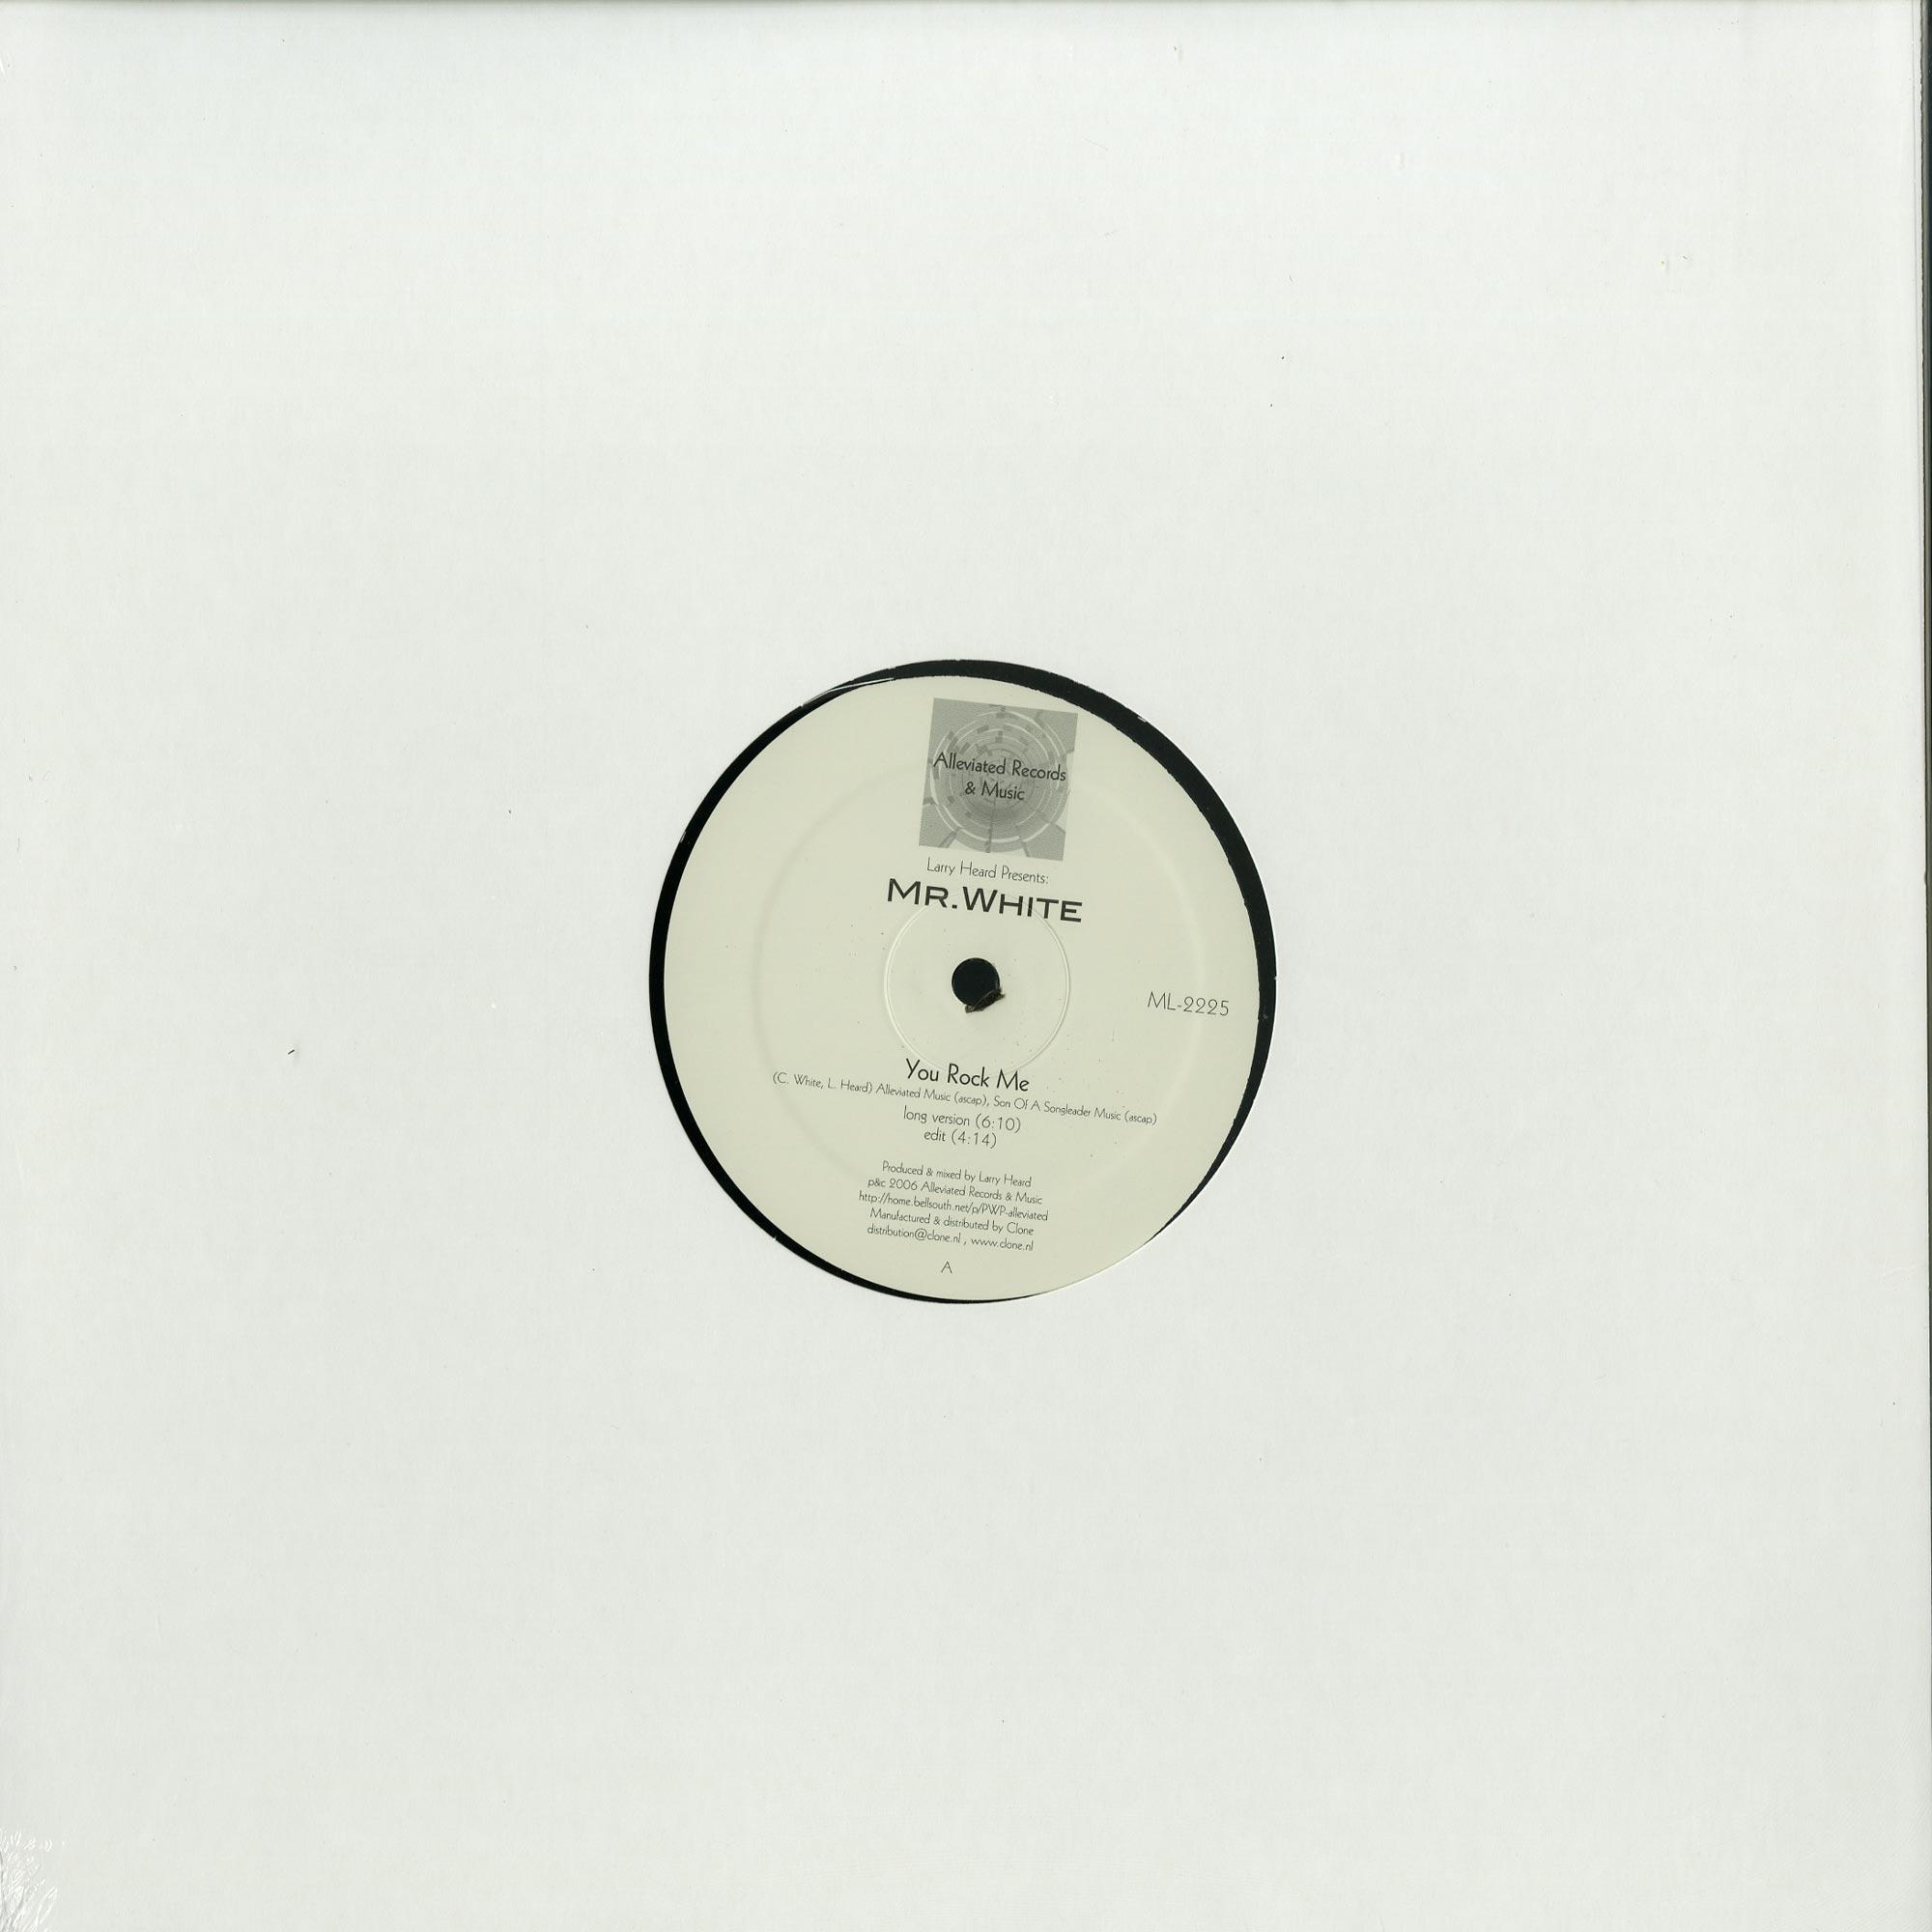 Larry Heard presents Mr. White - YOU ROCK ME / THE SUN CANT COMPARE